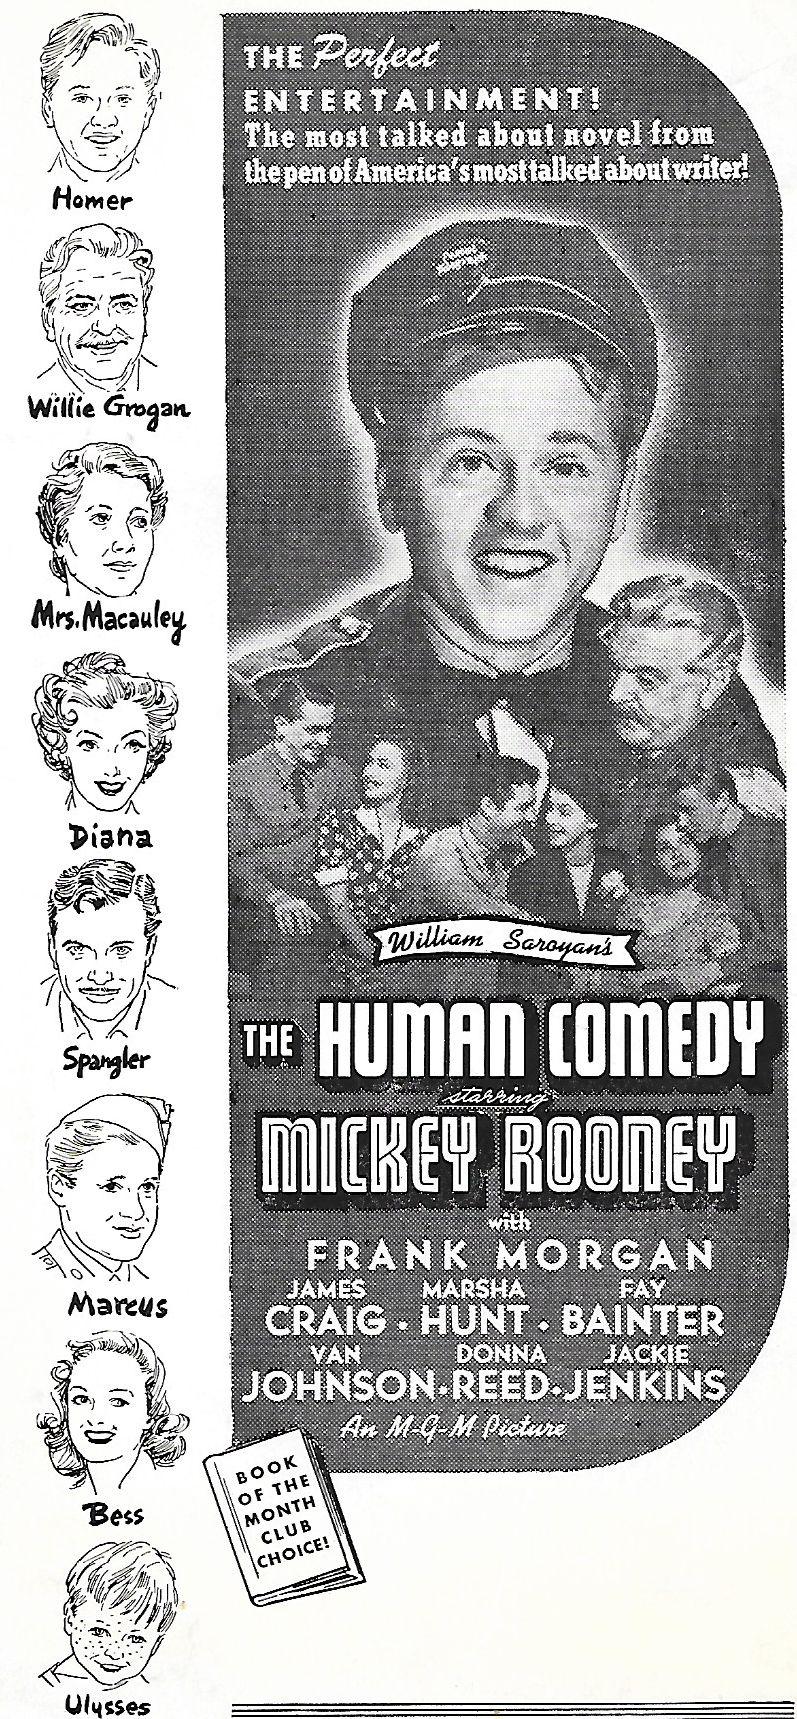 Donna Reed, Mickey Rooney, Van Johnson, Fay Bainter, James Craig, Marsha Hunt, Jackie 'Butch' Jenkins, and Frank Morgan in The Human Comedy (1943)